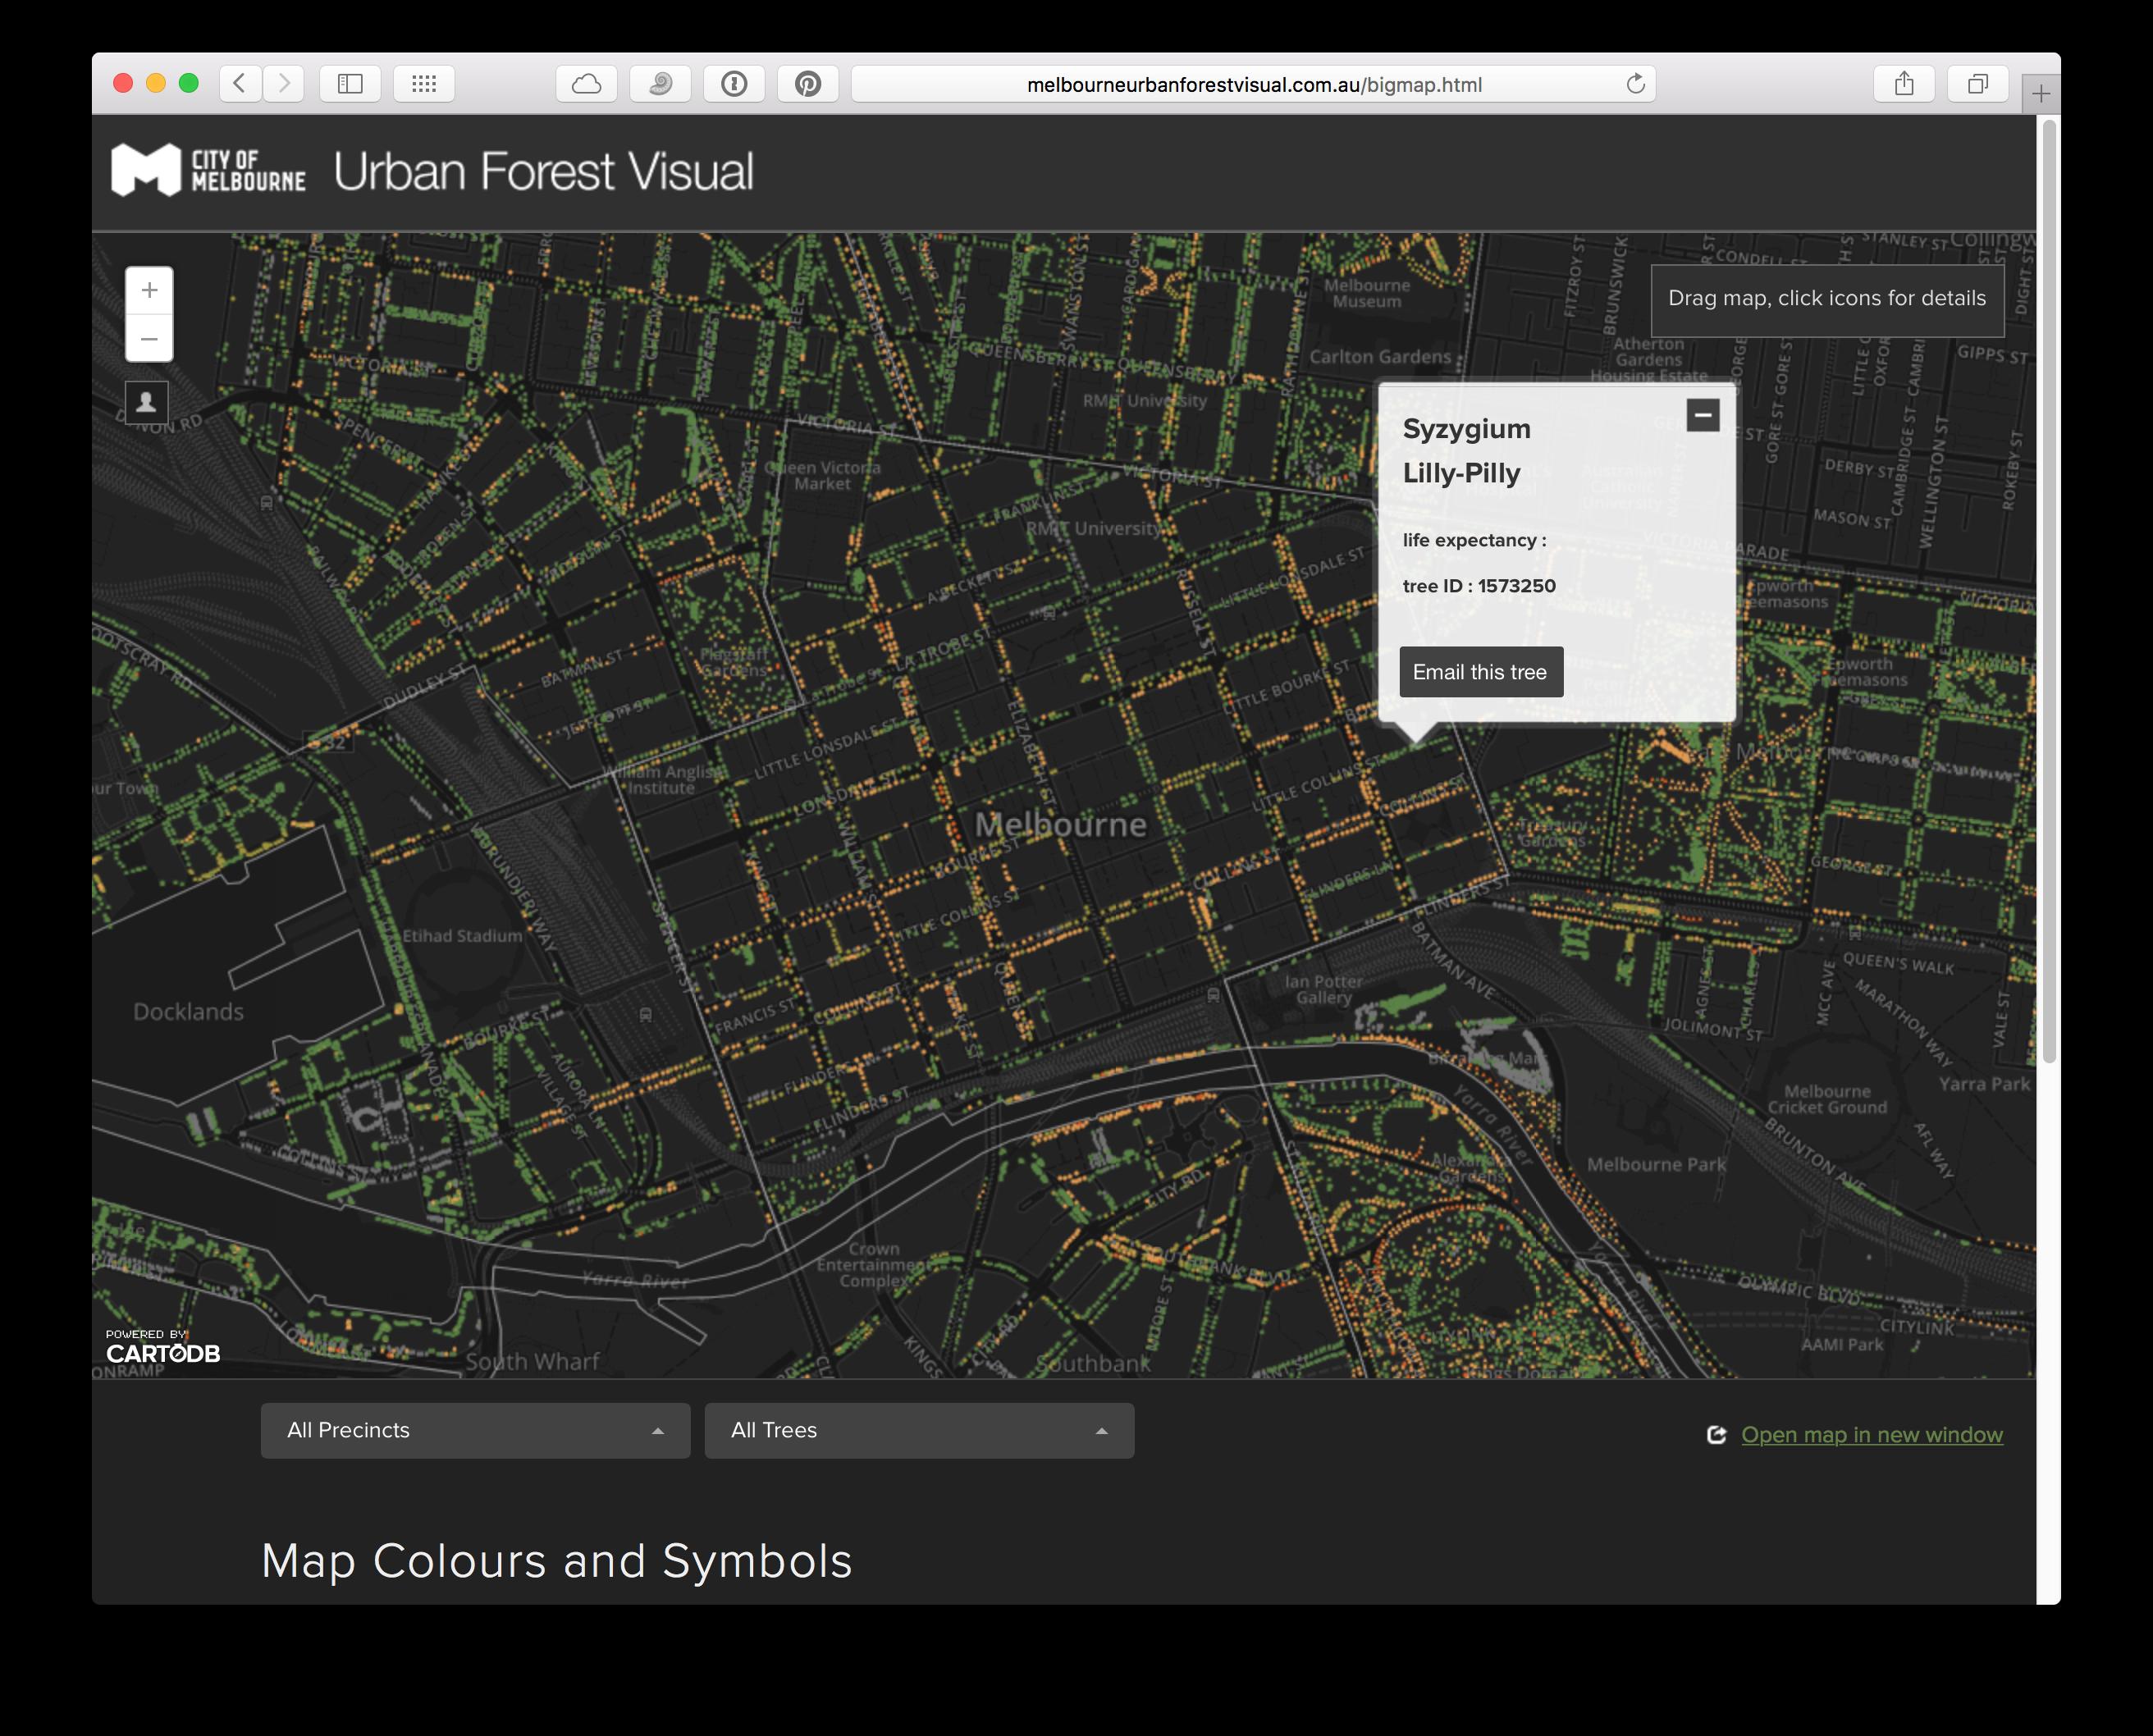 Melbourne Urban Forest Visual / Screenshot